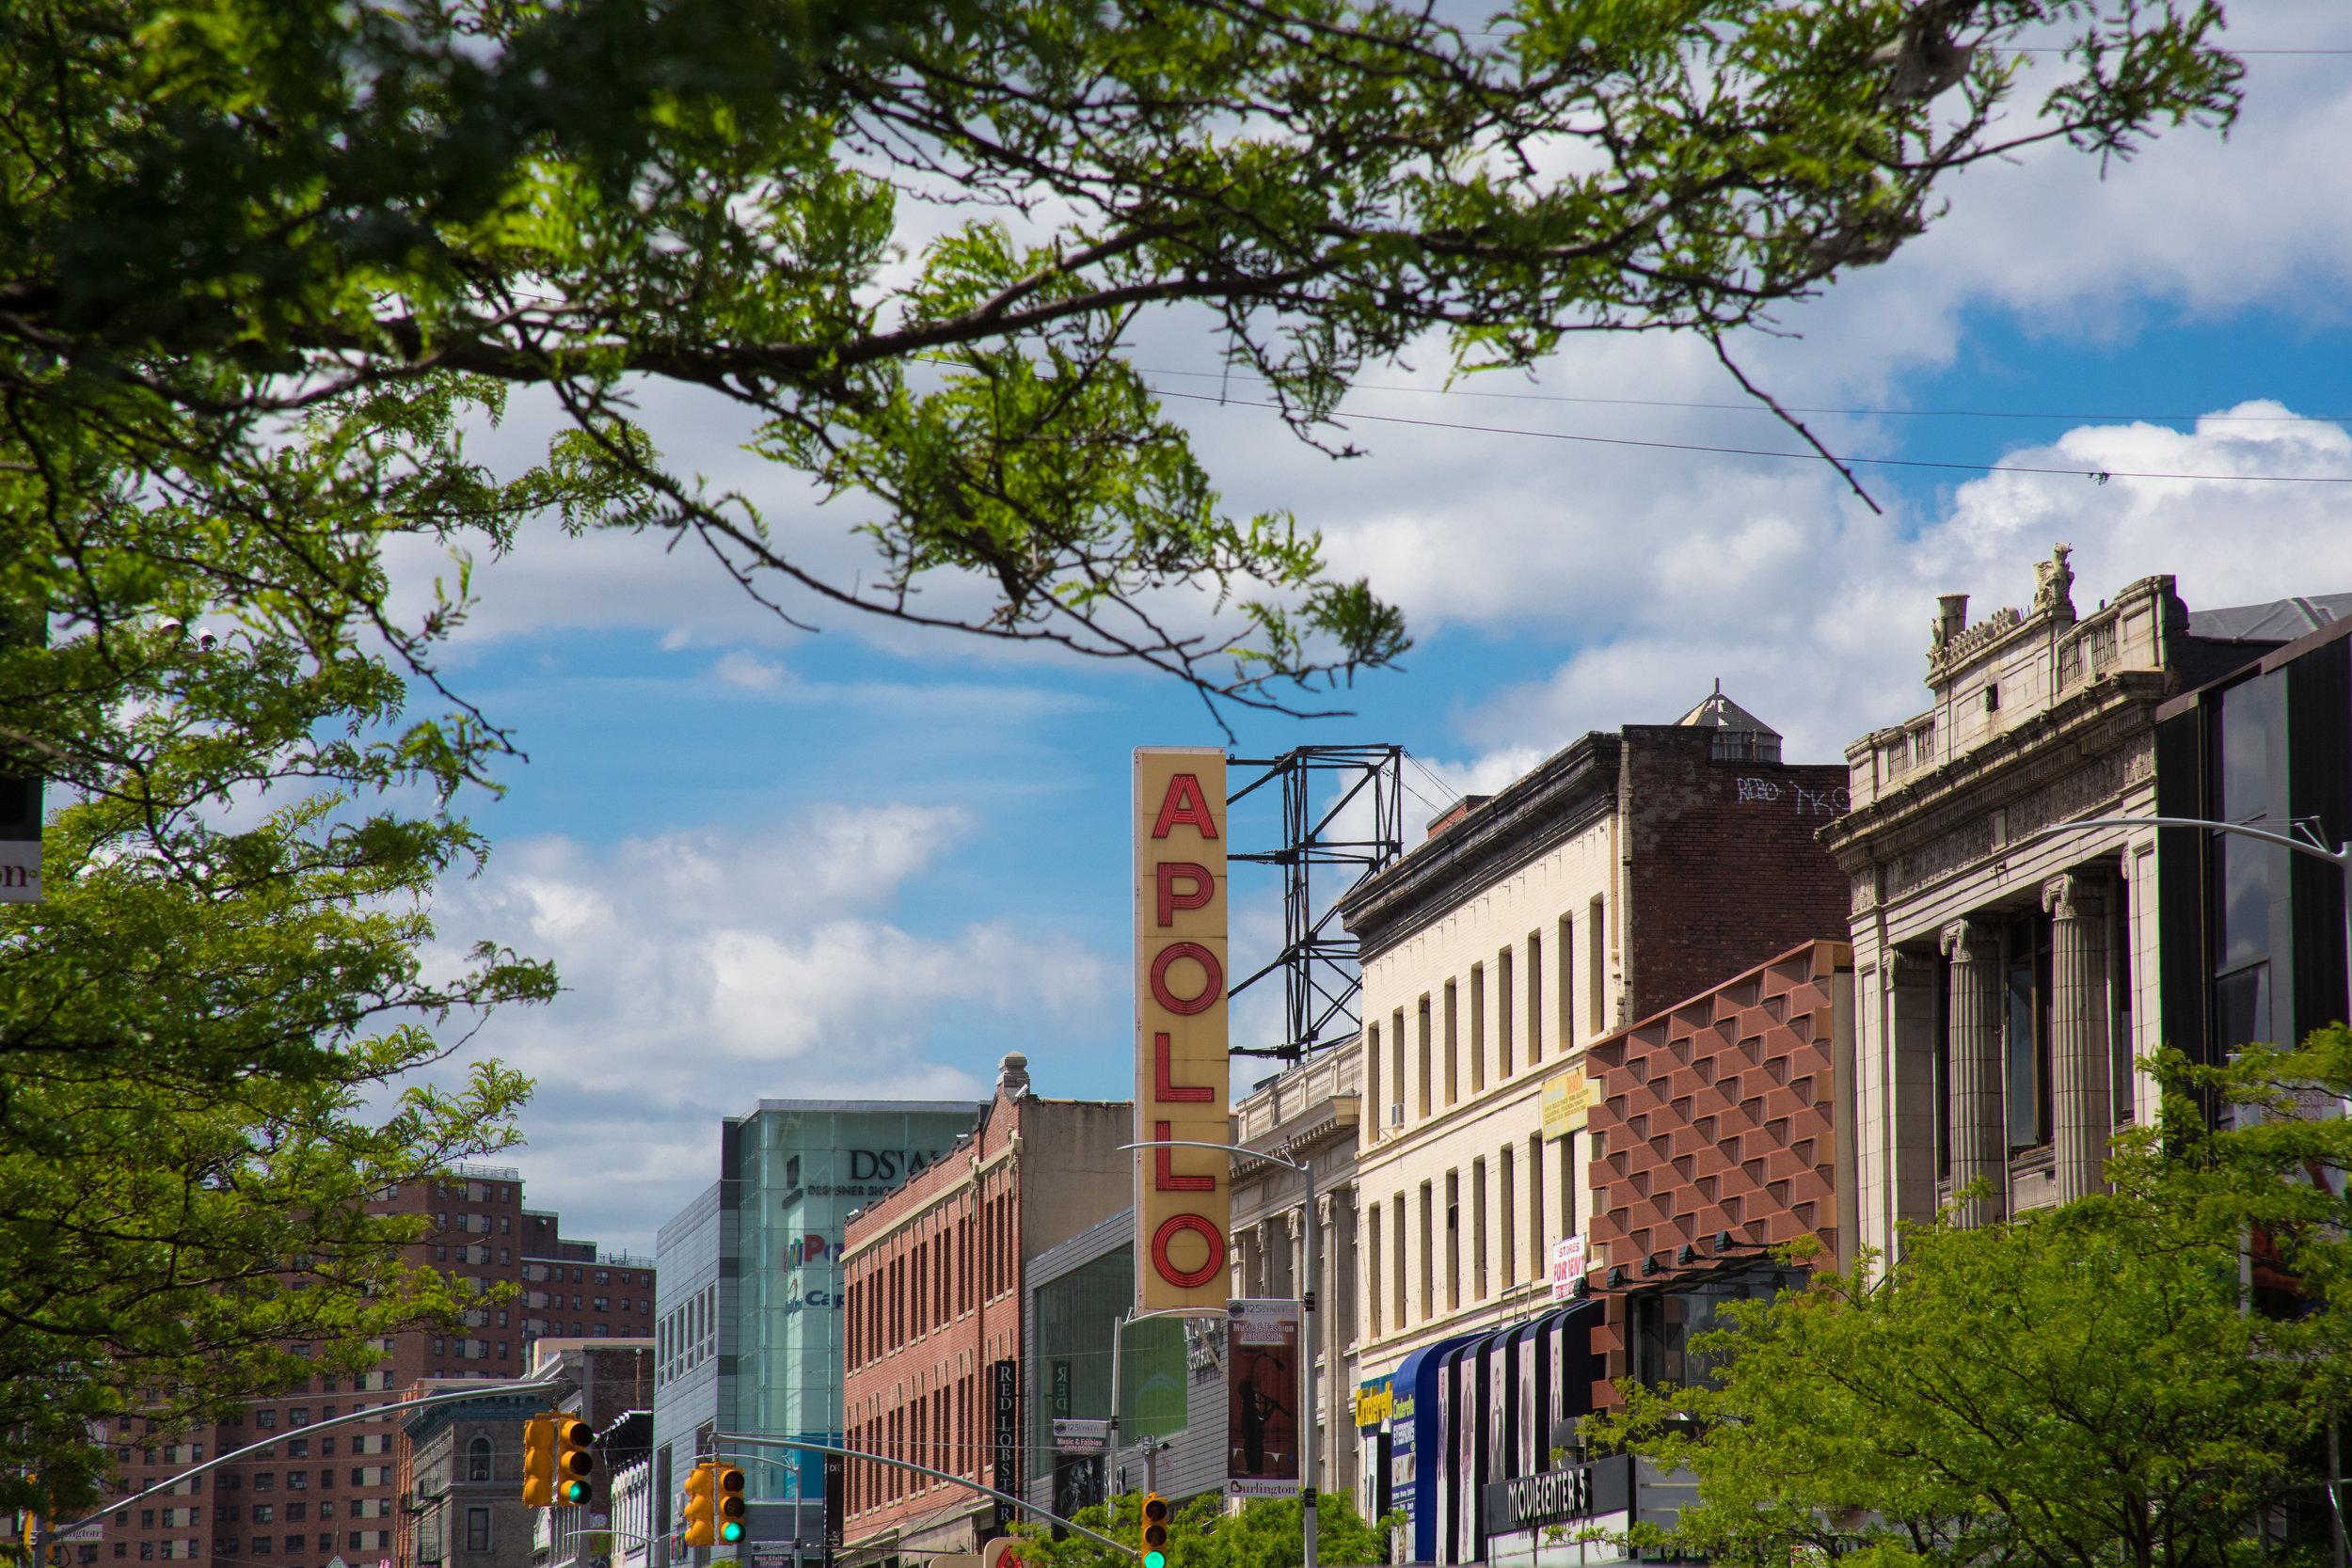 LSNY_Harlem-29.jpg